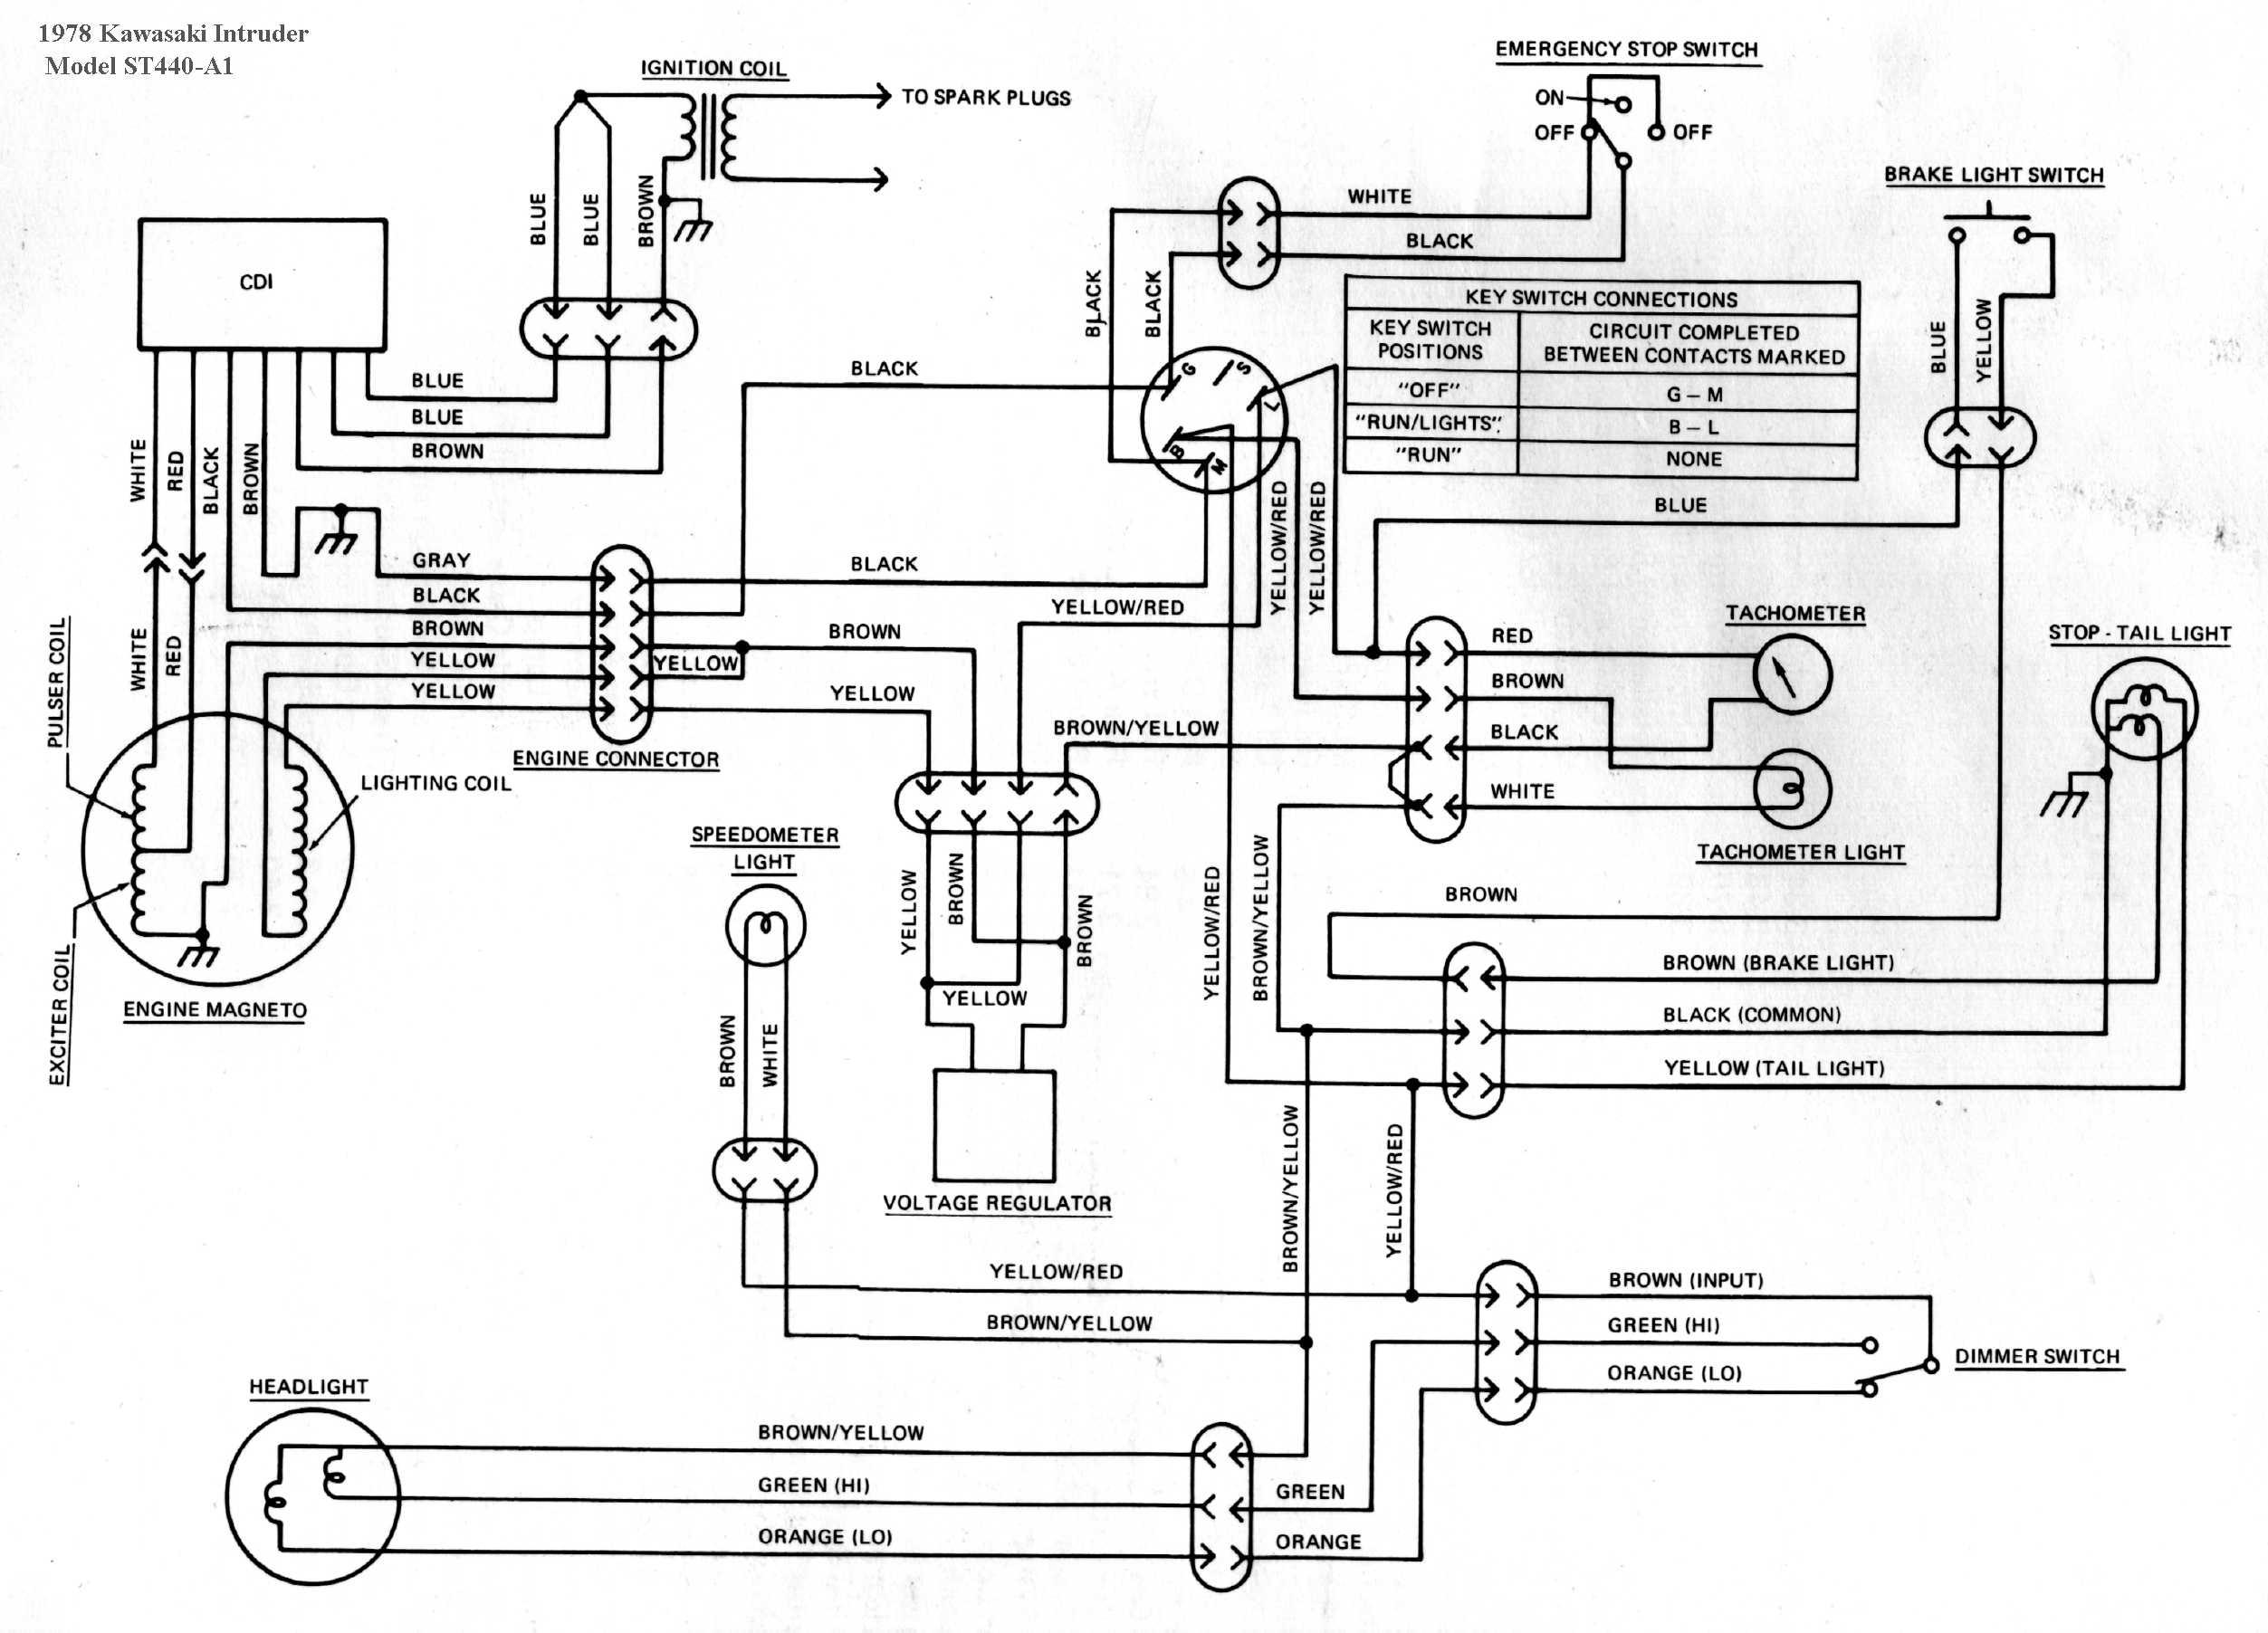 1994 yamaha banshee wiring diagram class for library management system 2002 polaris trailblazer schematic 2000 st440a1 2008